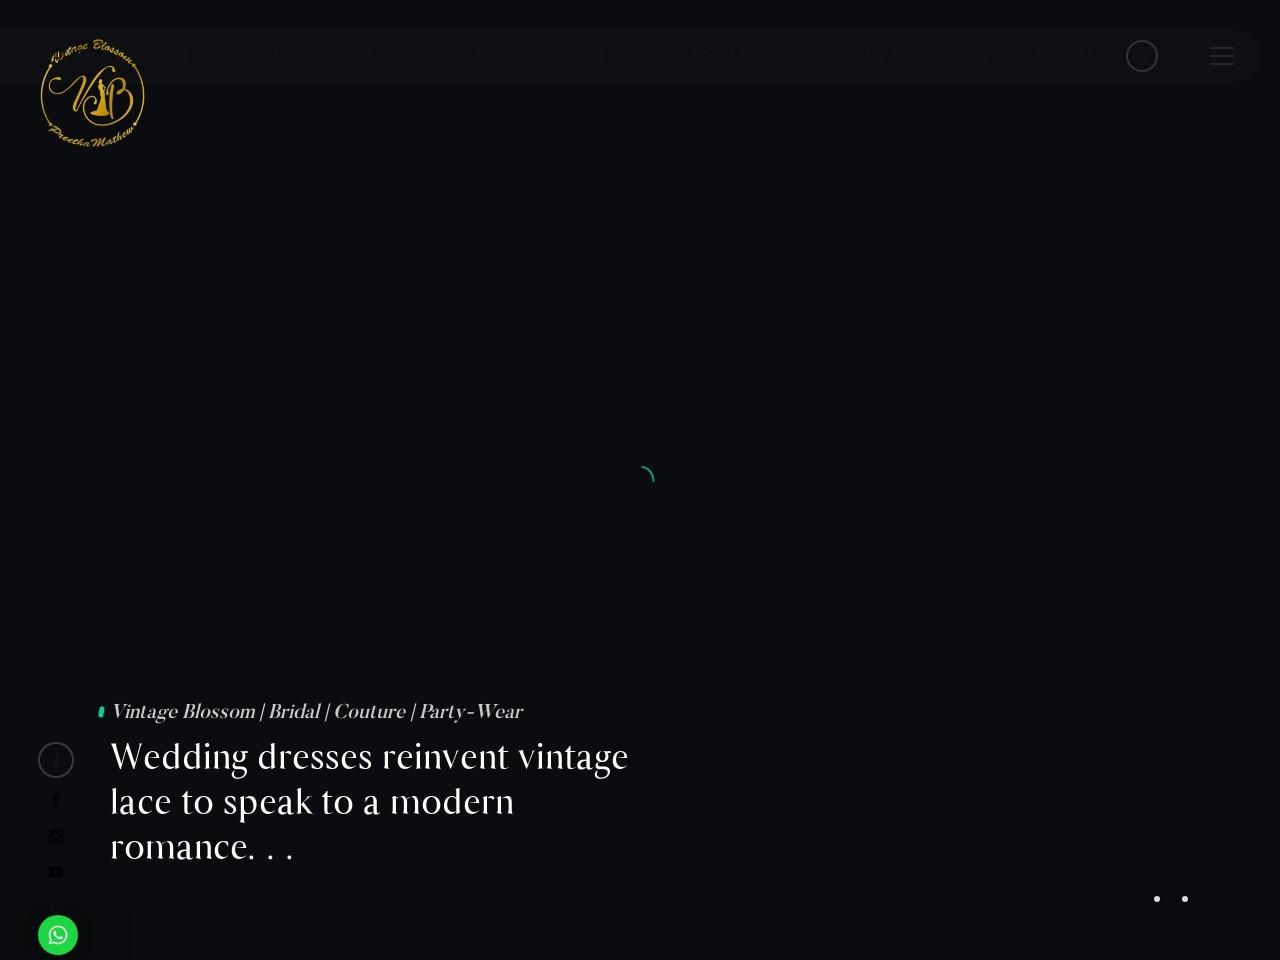 Bridal Gowns Trivandrum | Vintage Blossom Trivandrum